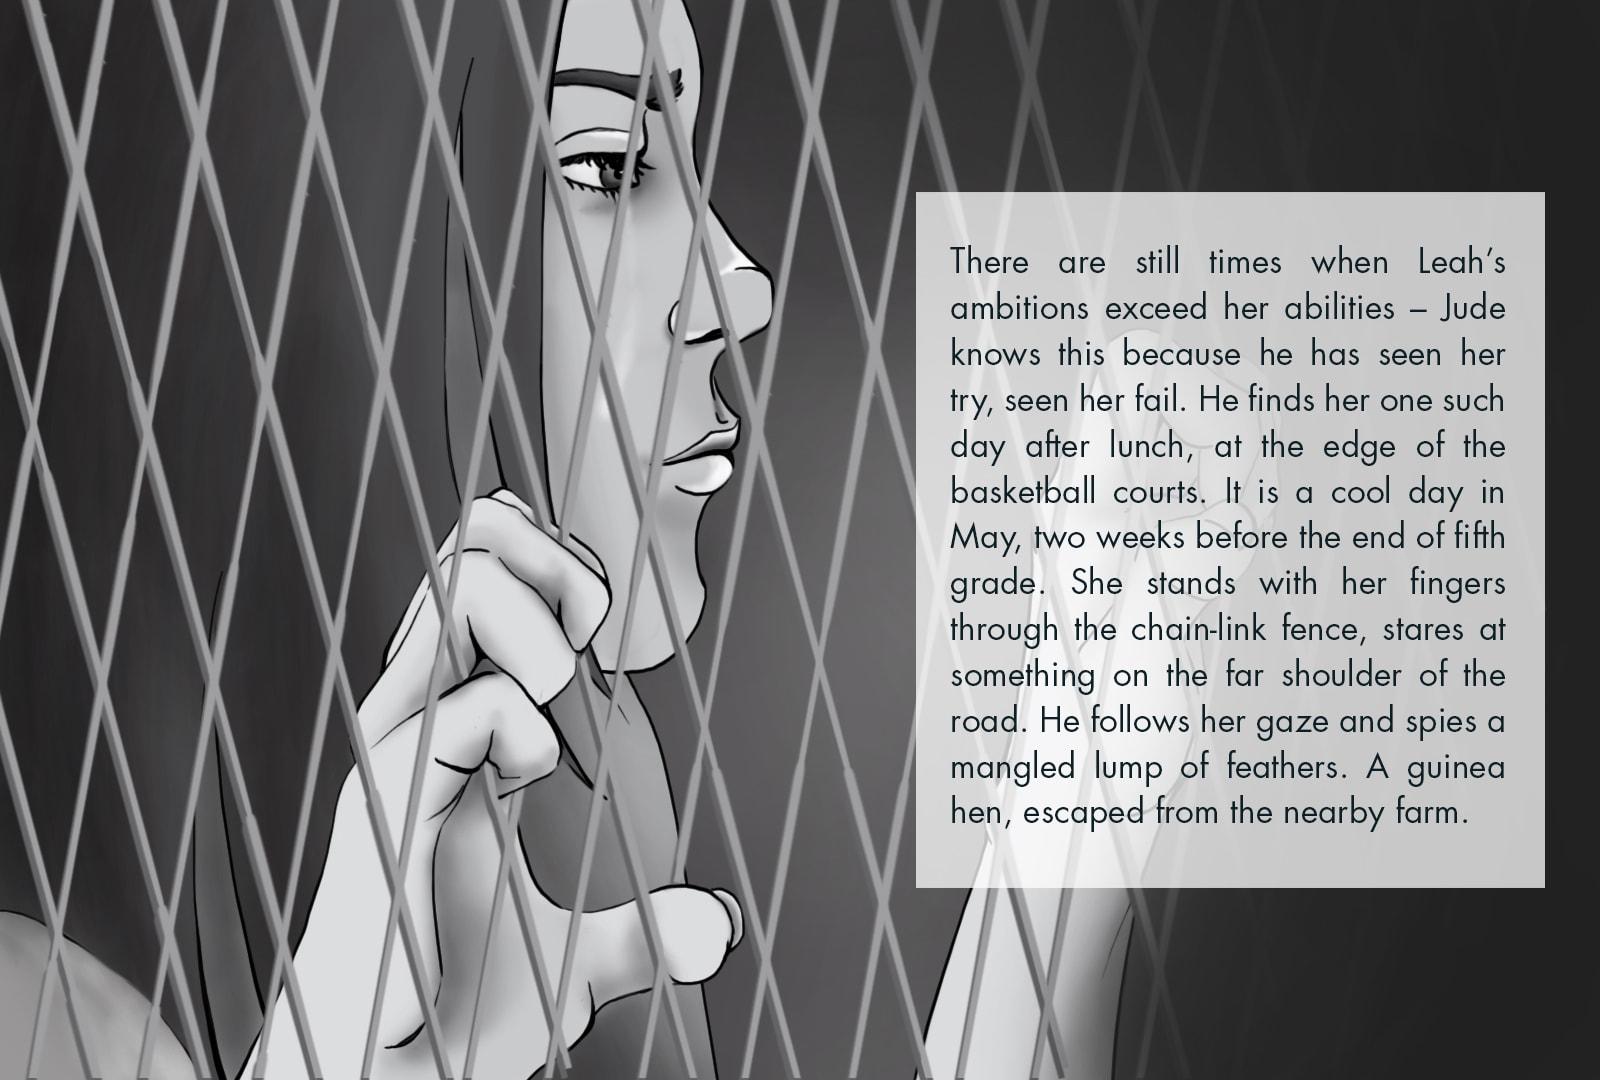 Monthly Fiction Maker illustration illustraded story Seth Marlin Alyssa Cooper page 1